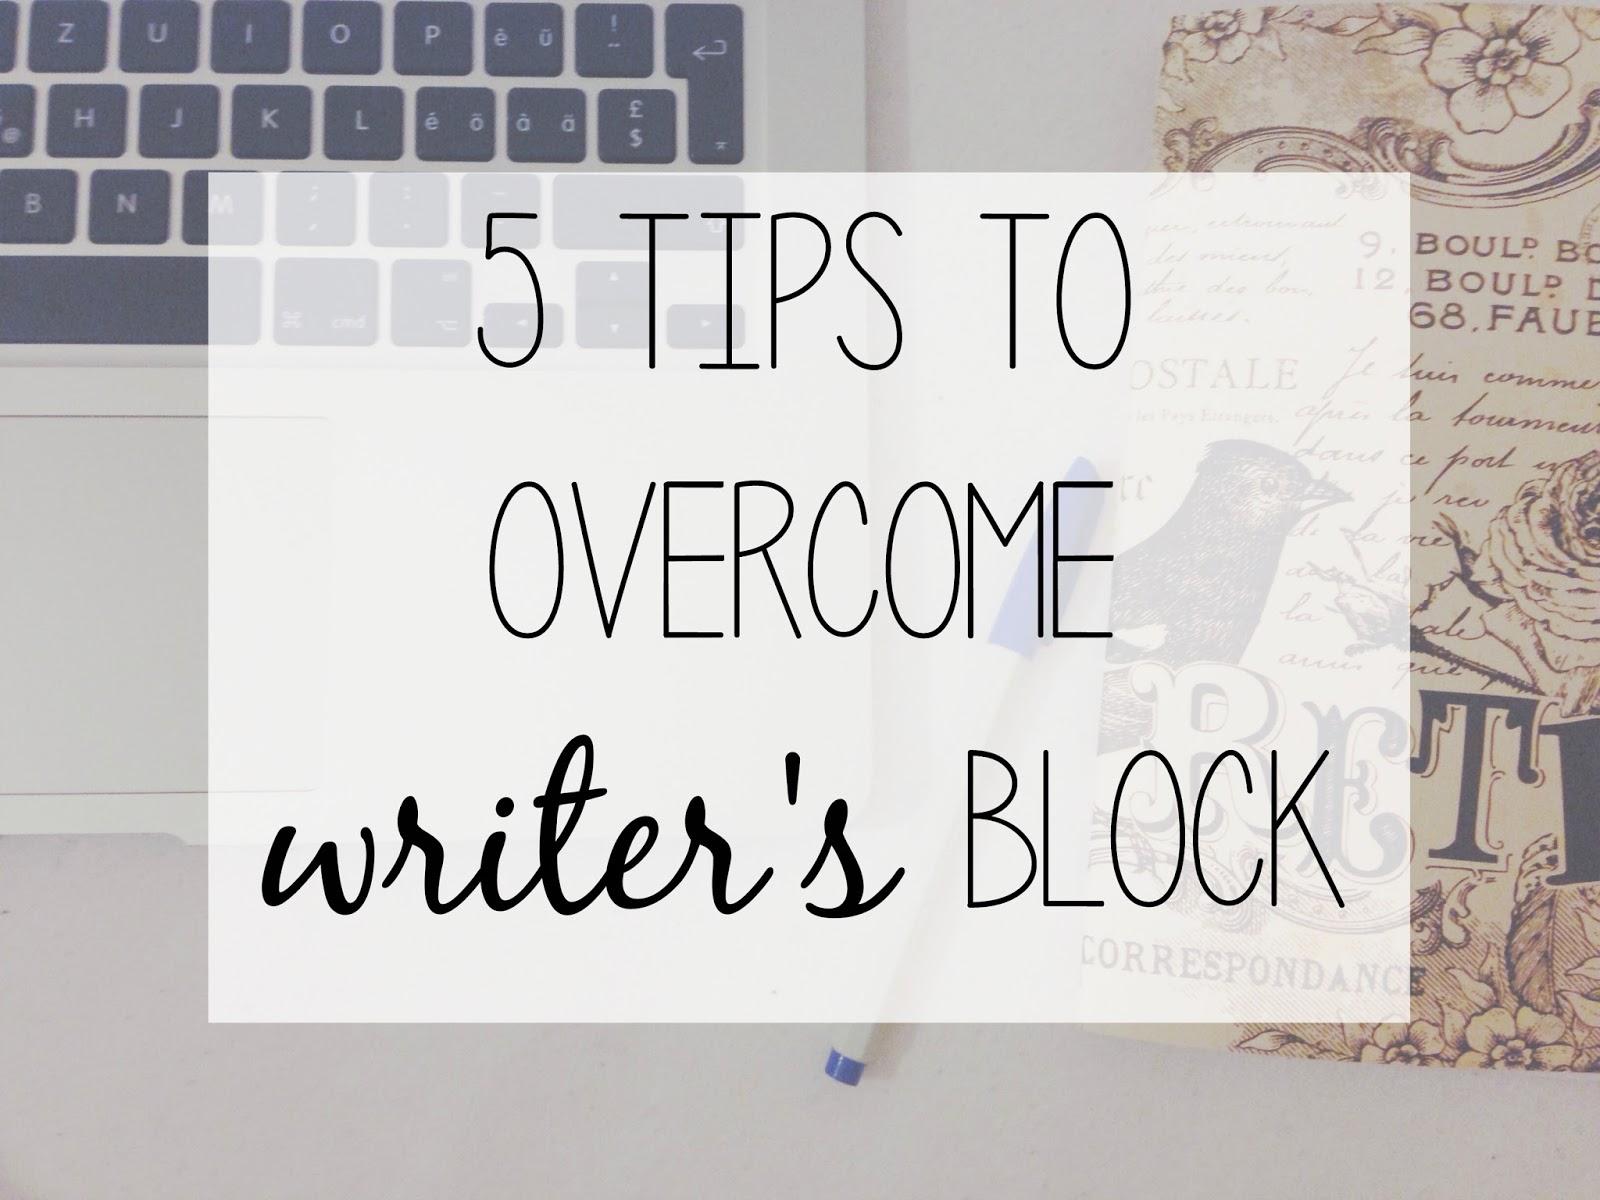 How do i overcome writers block?